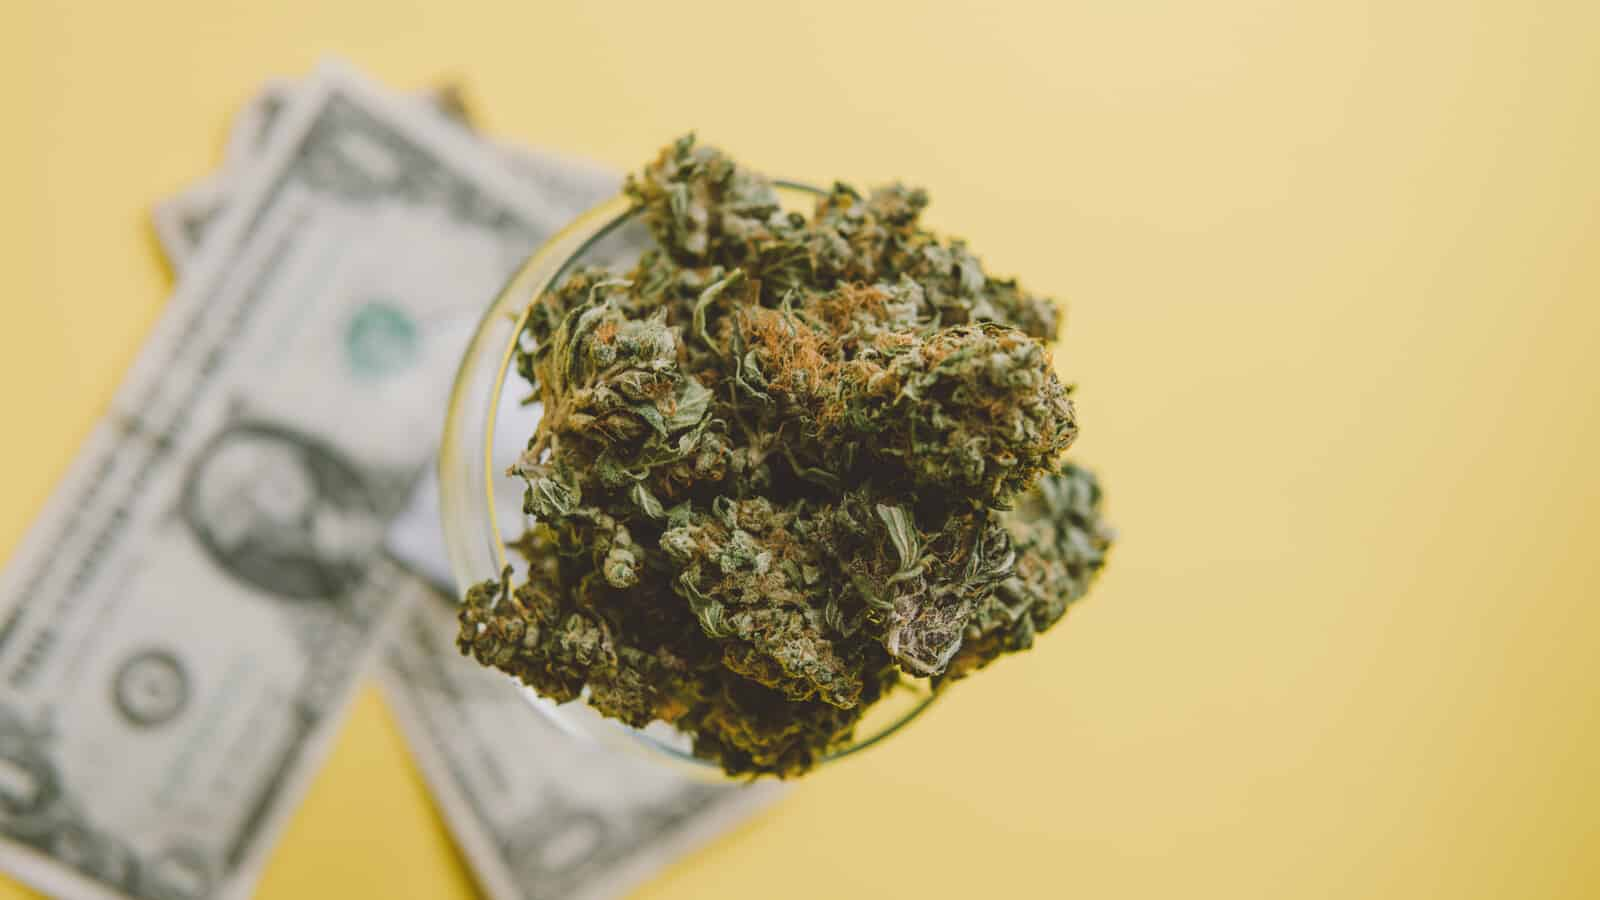 Cannabis bud on top of dollar bills